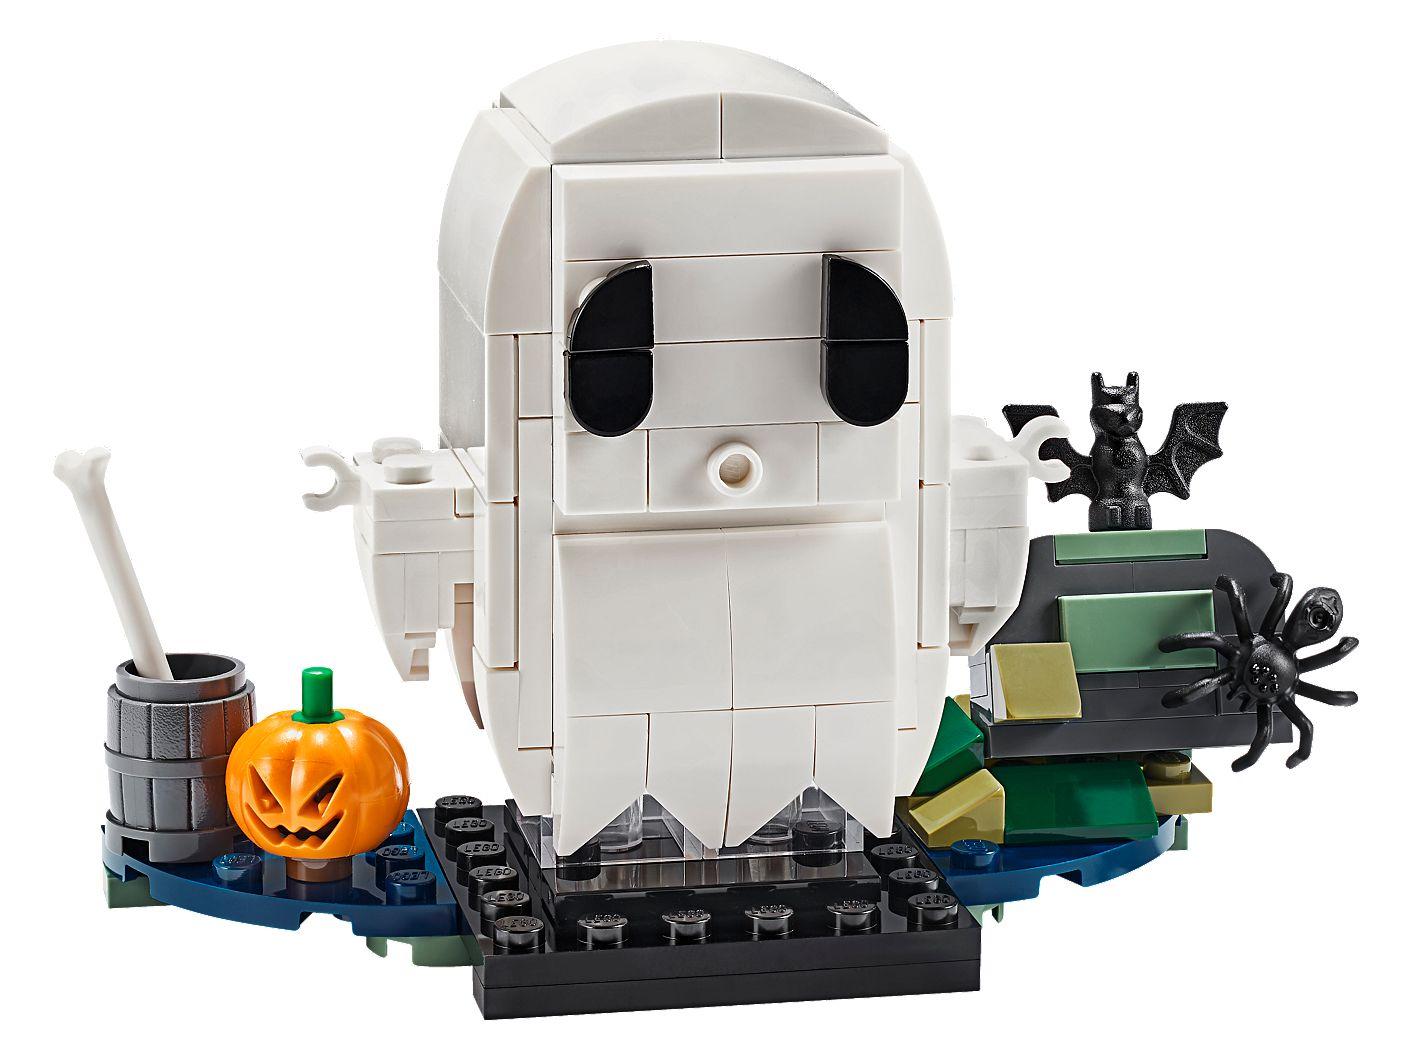 Le fantôme d'Halloween 40351 | BrickHeadz | Bouti...